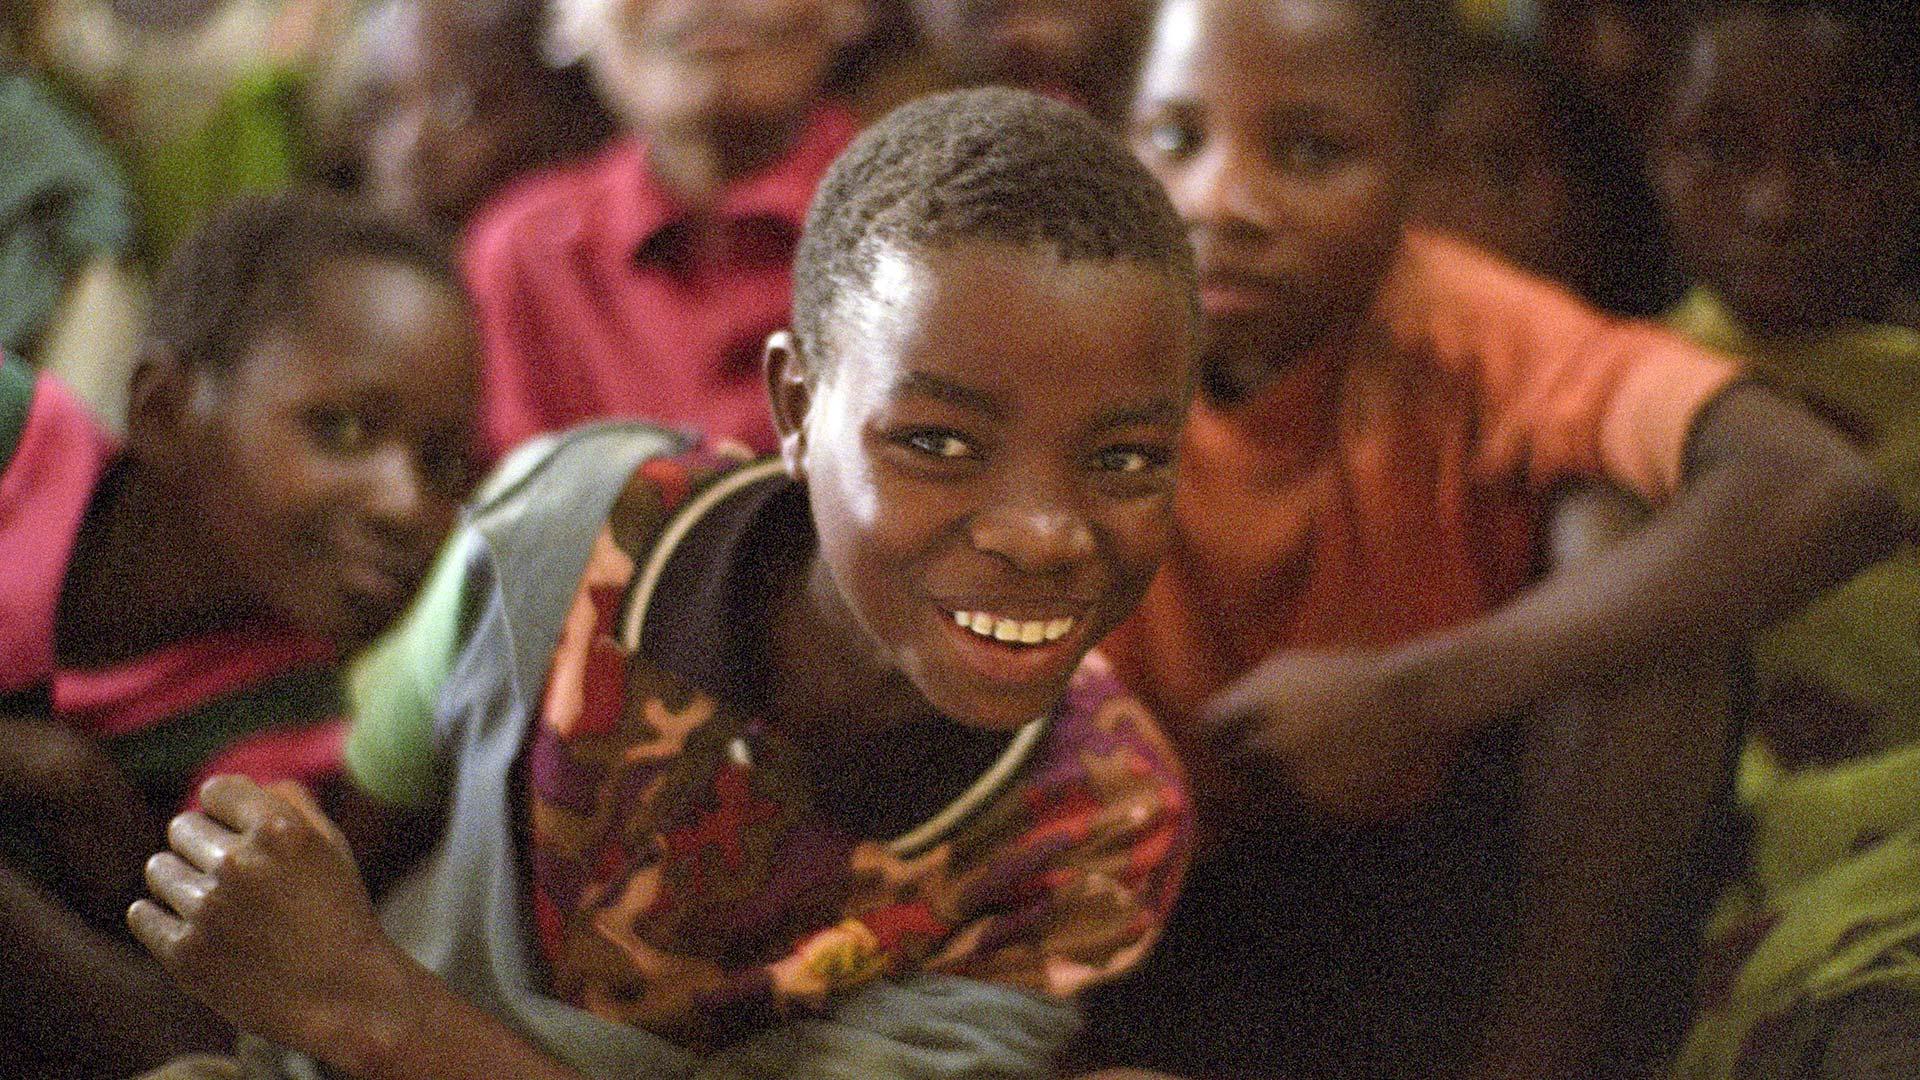 Smiling Malawian children